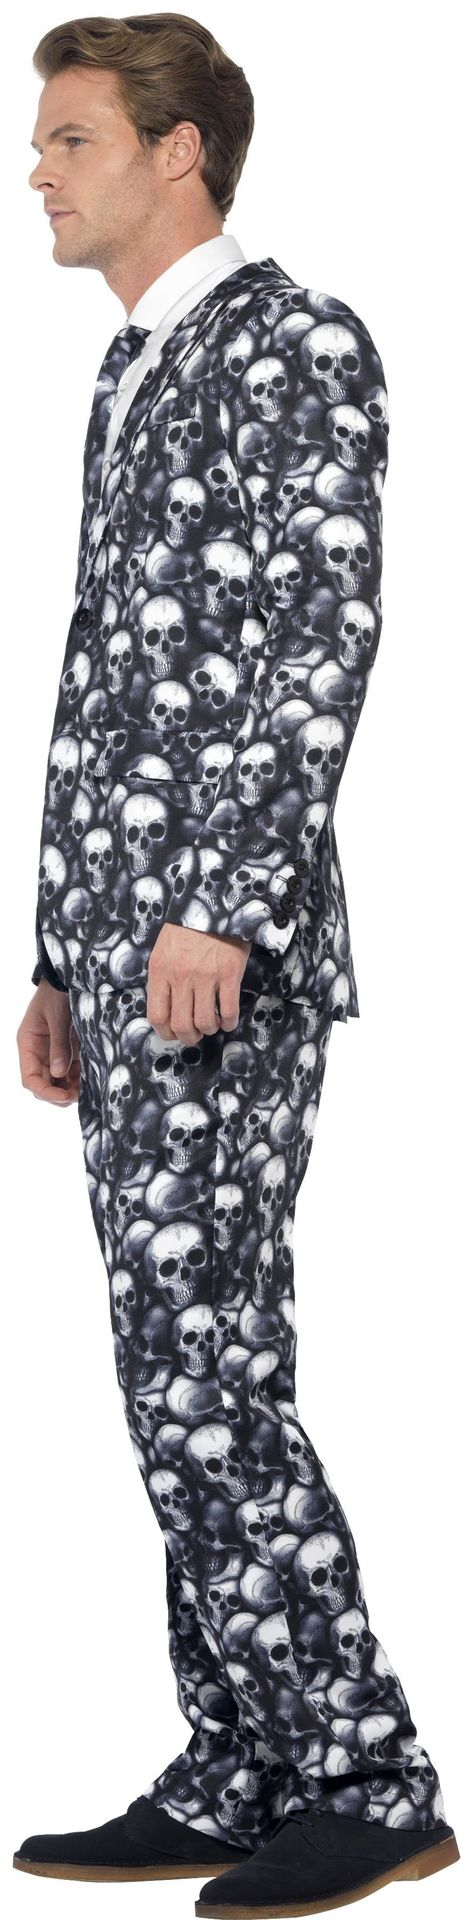 Skeleton Suit kostuum